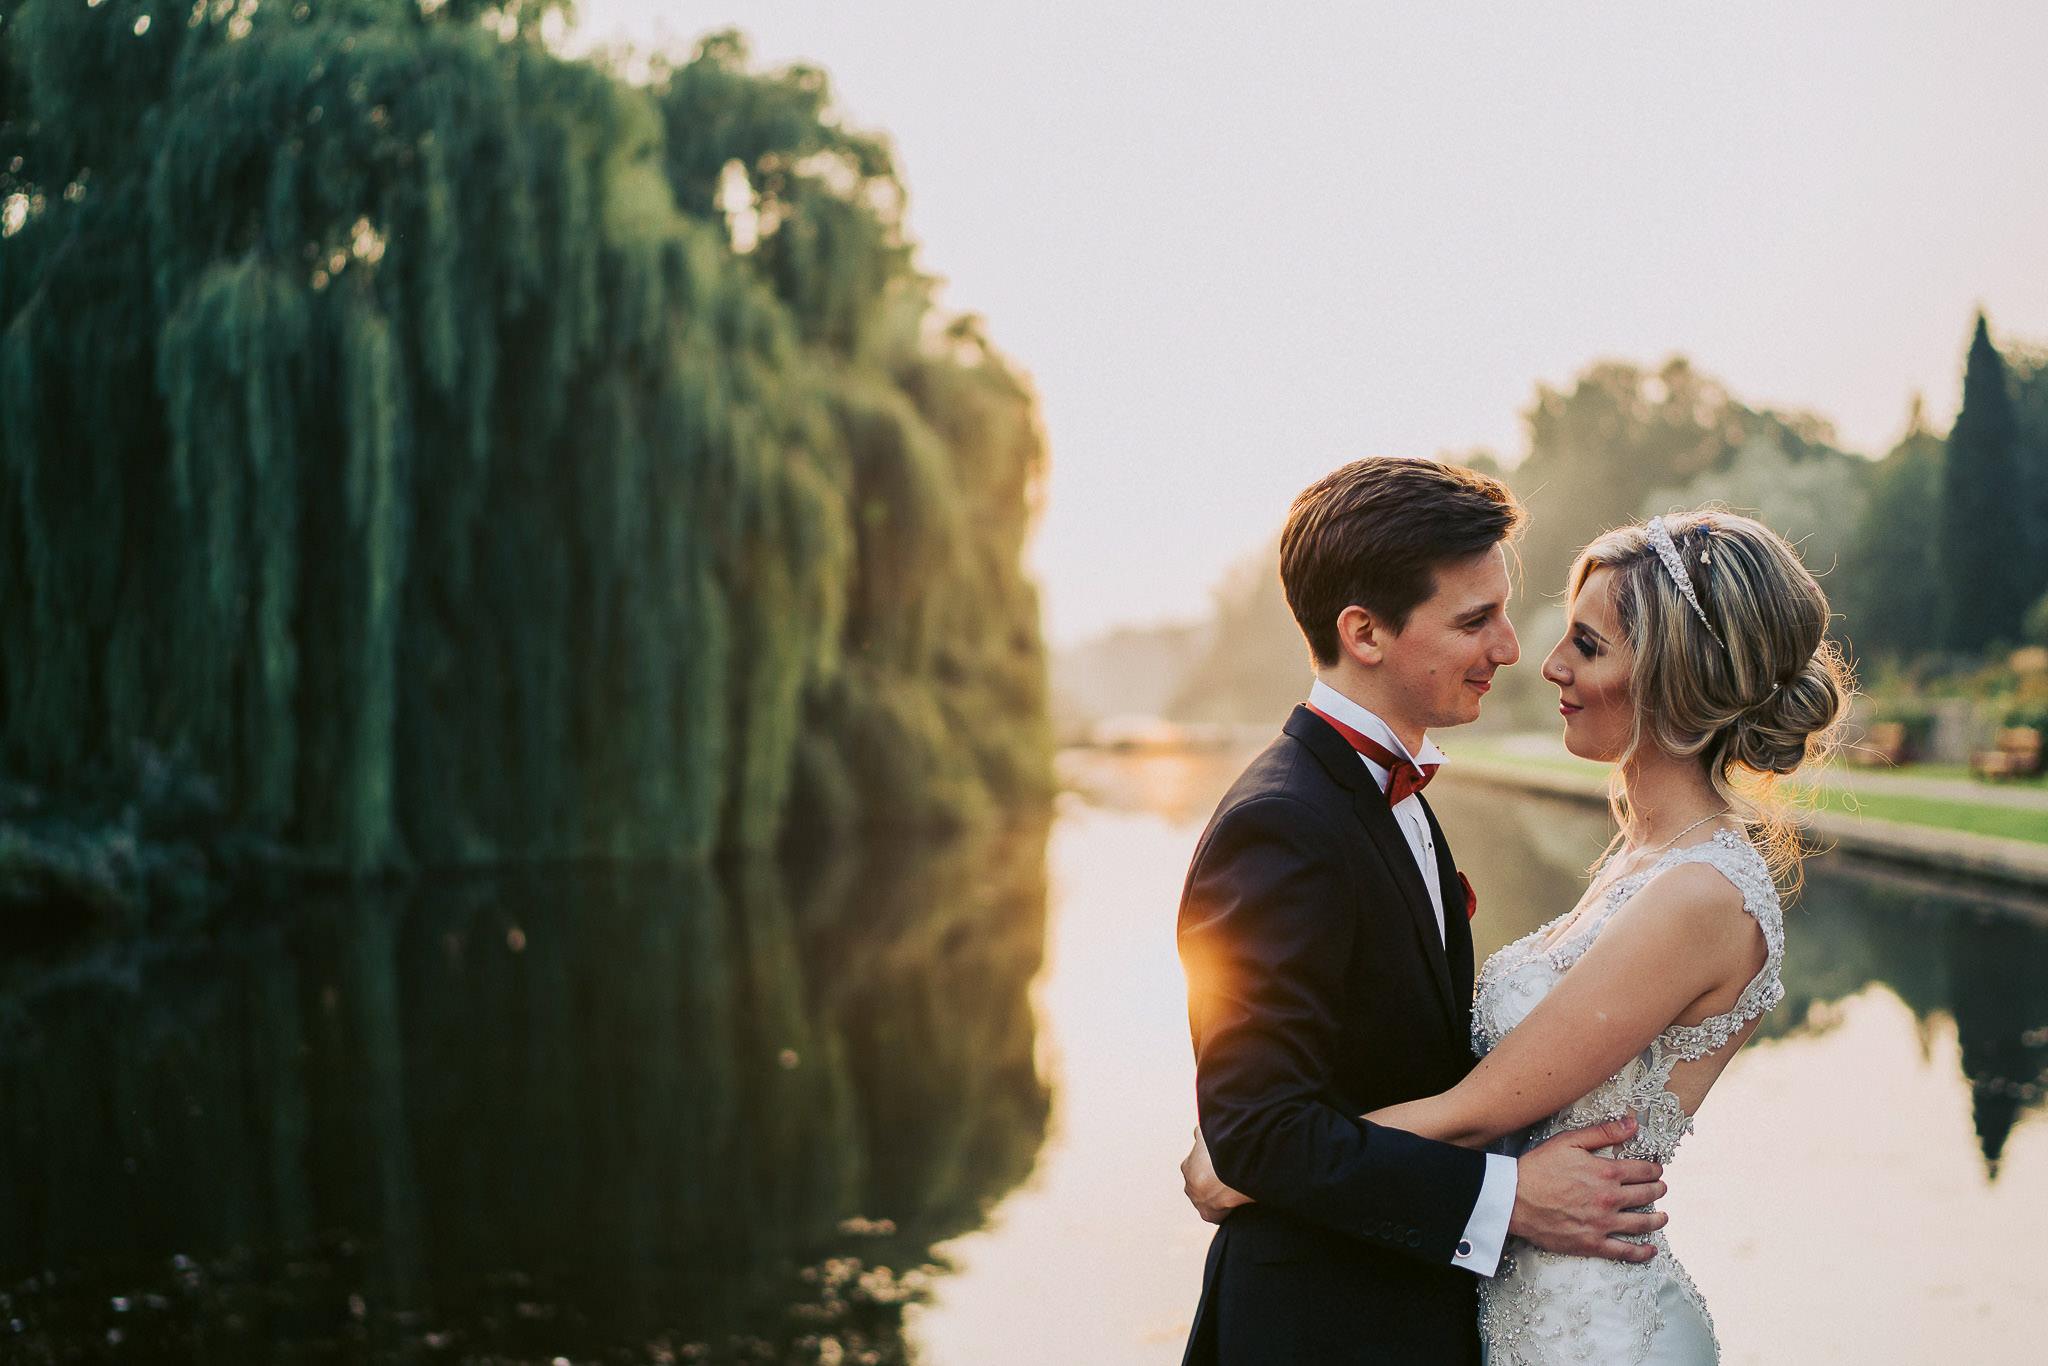 Staffordshire-Wedding-Photographer-208.jpg